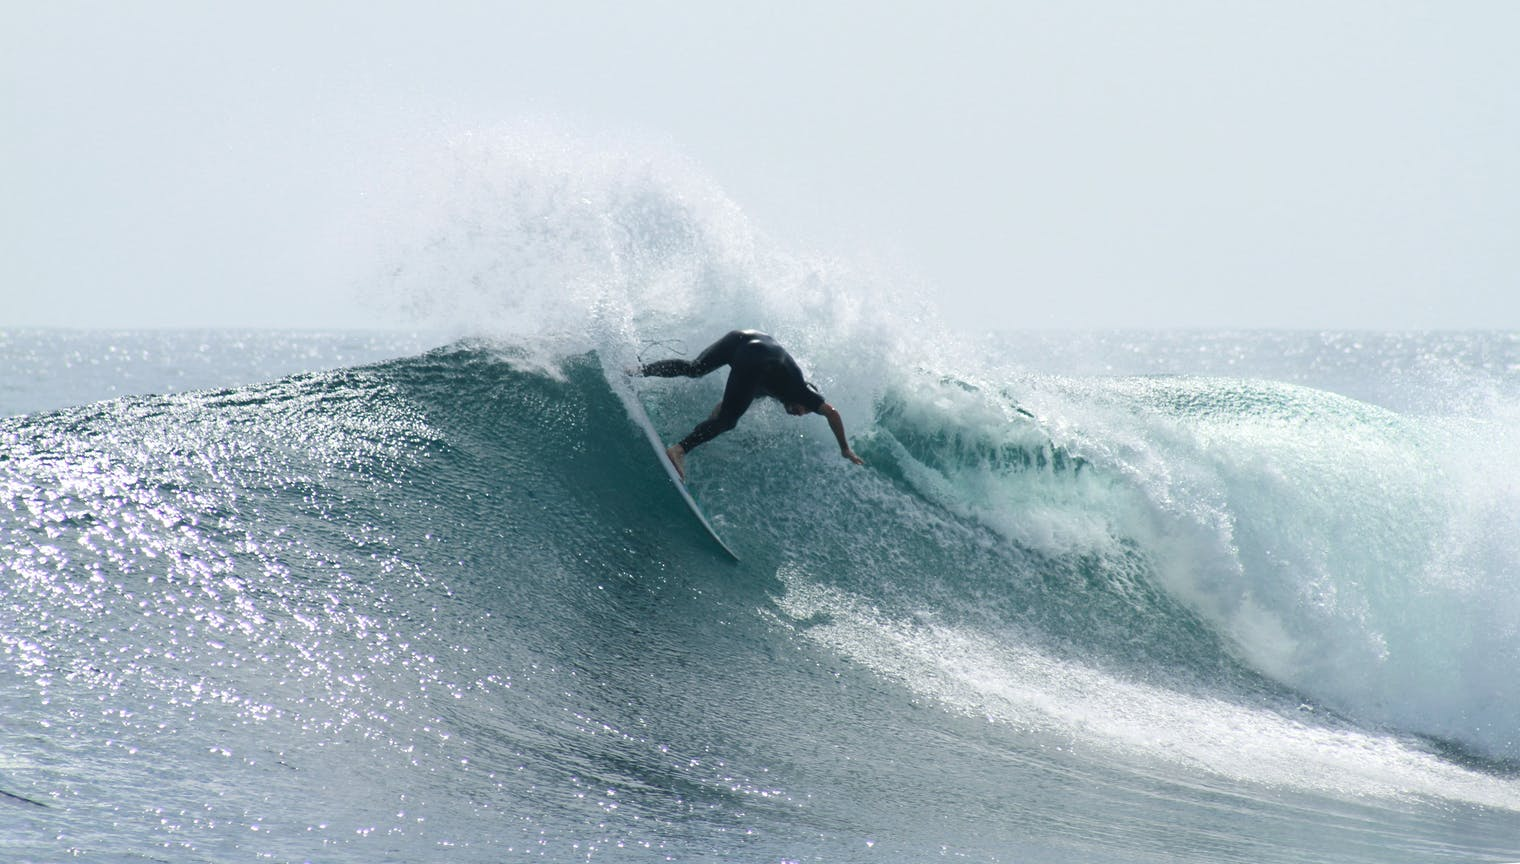 Surfing HT's in Mentawai